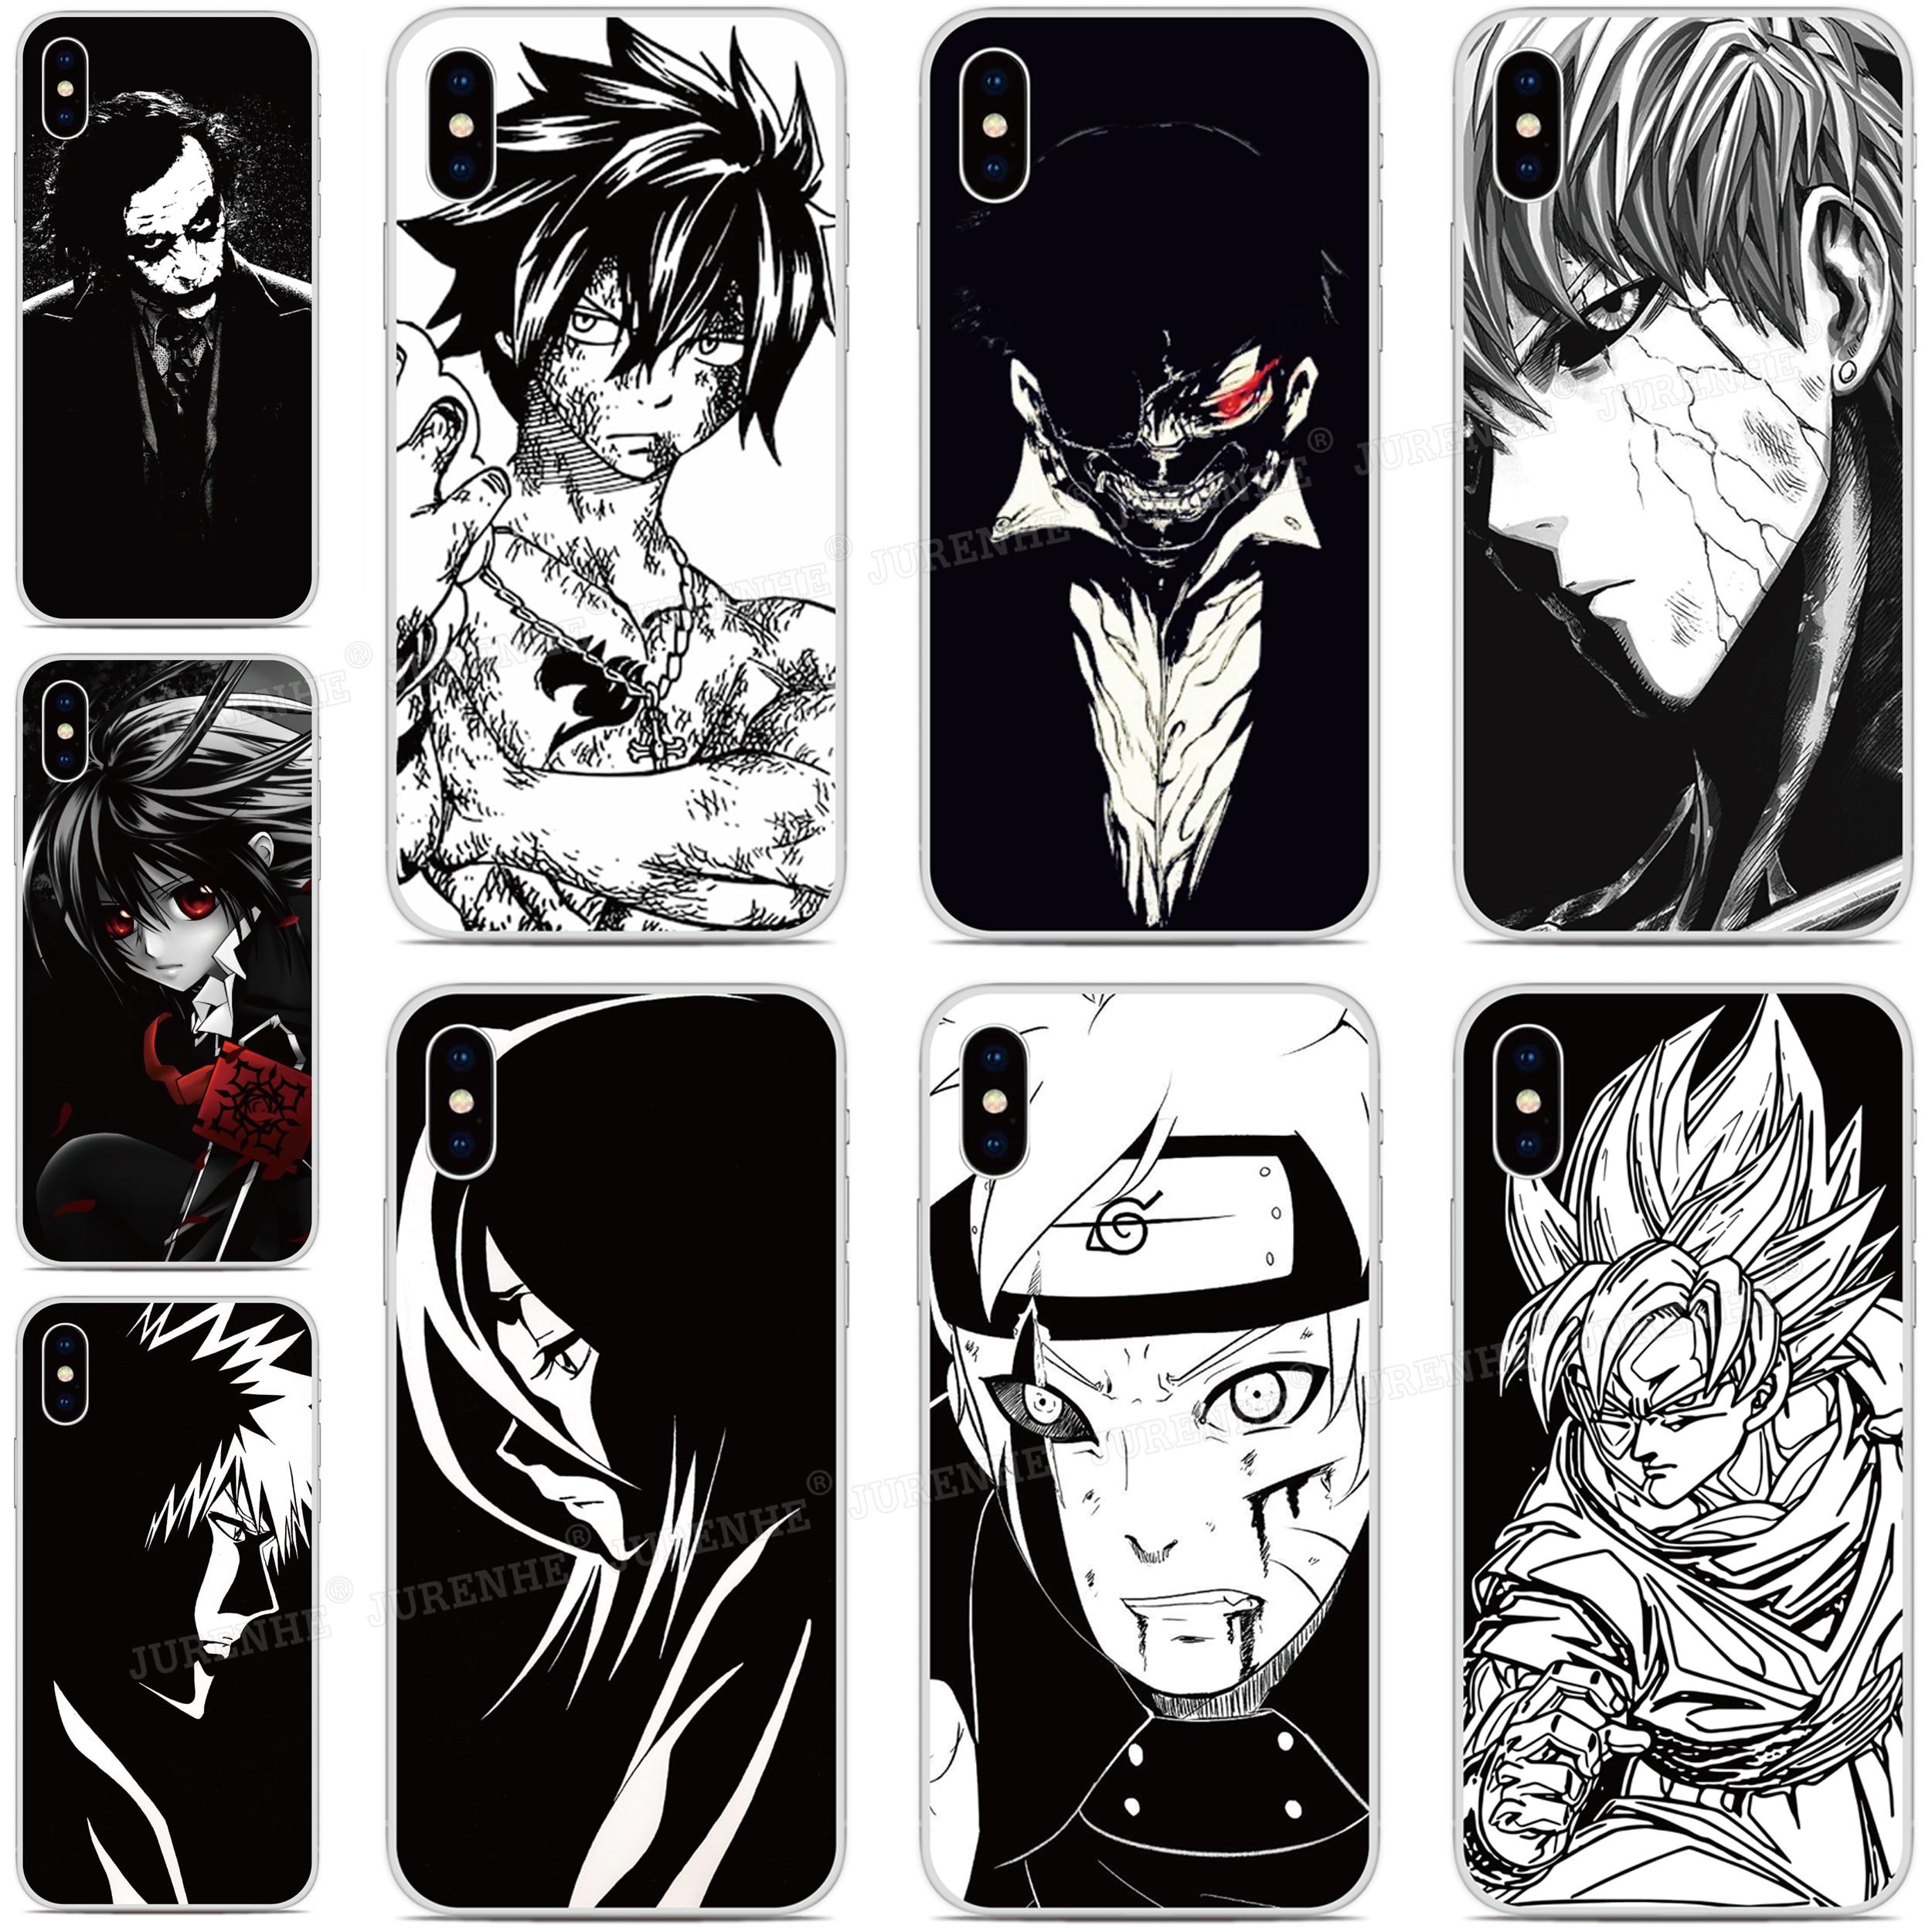 2019 negro blanco Anime cubierta de teléfono de TPU suave para LG K50s K40s K20 K30 K40 K50 Q60 X2 G8X G8S V60 ThinQ K61 K51S K41S cubierta